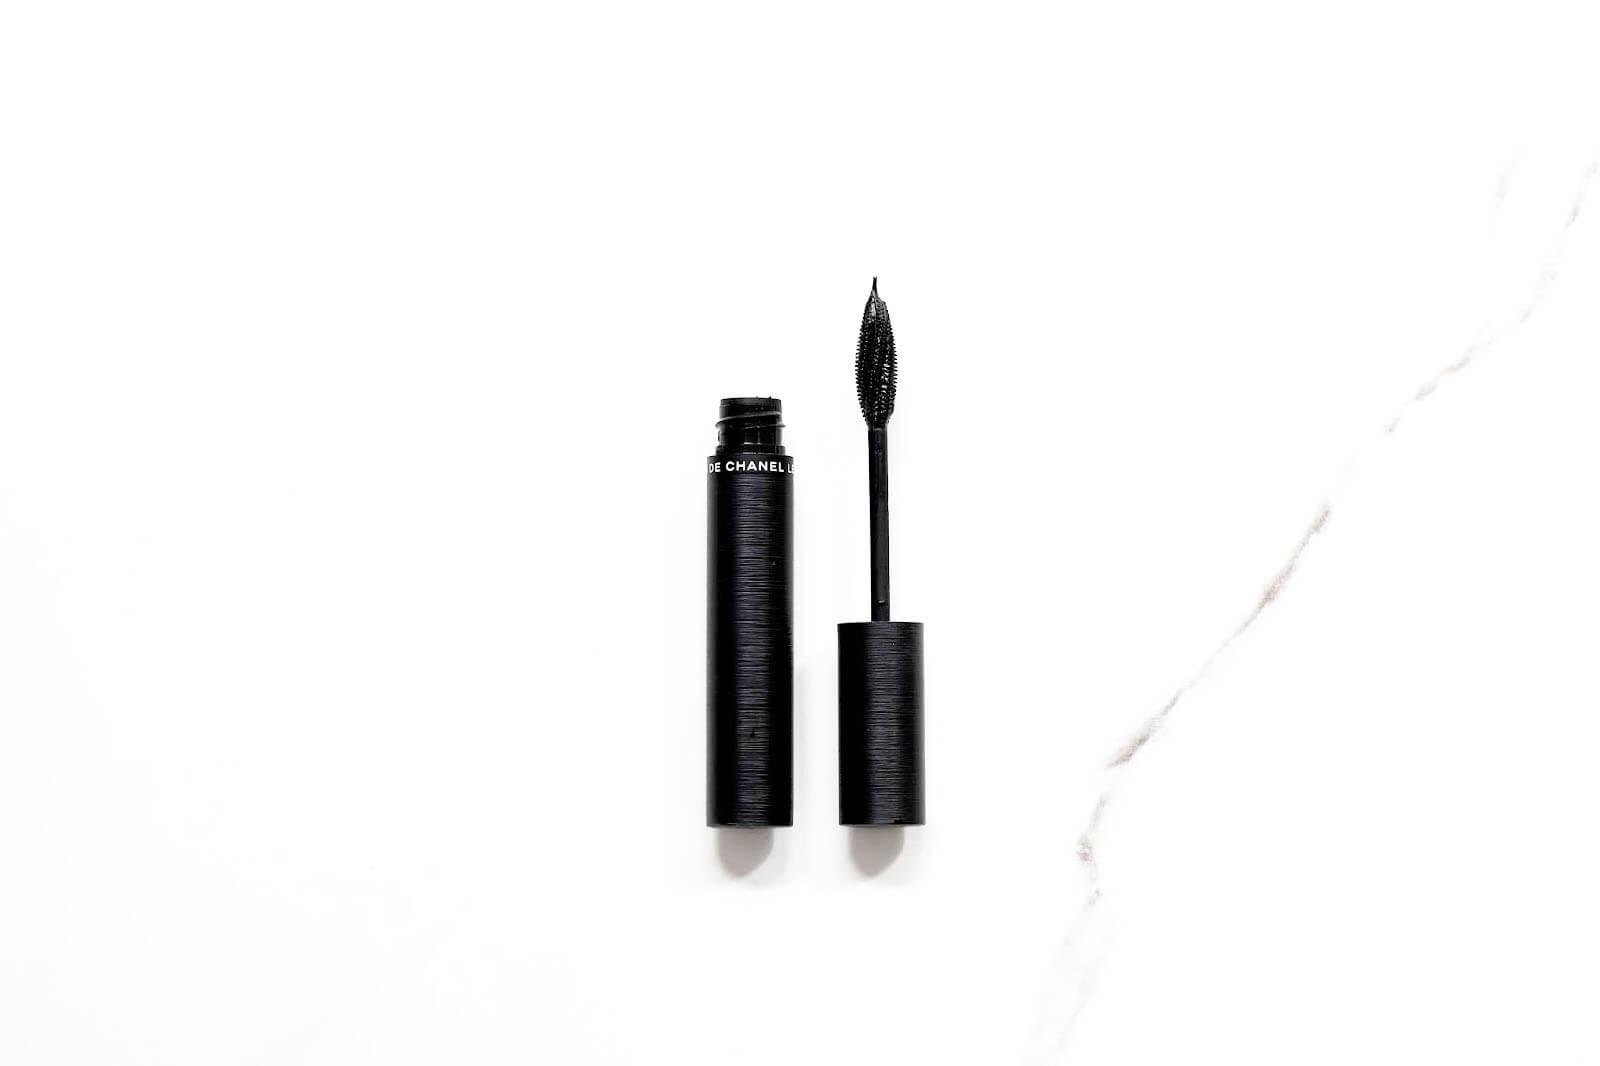 Chanel Mascara Le Volume Stretch test